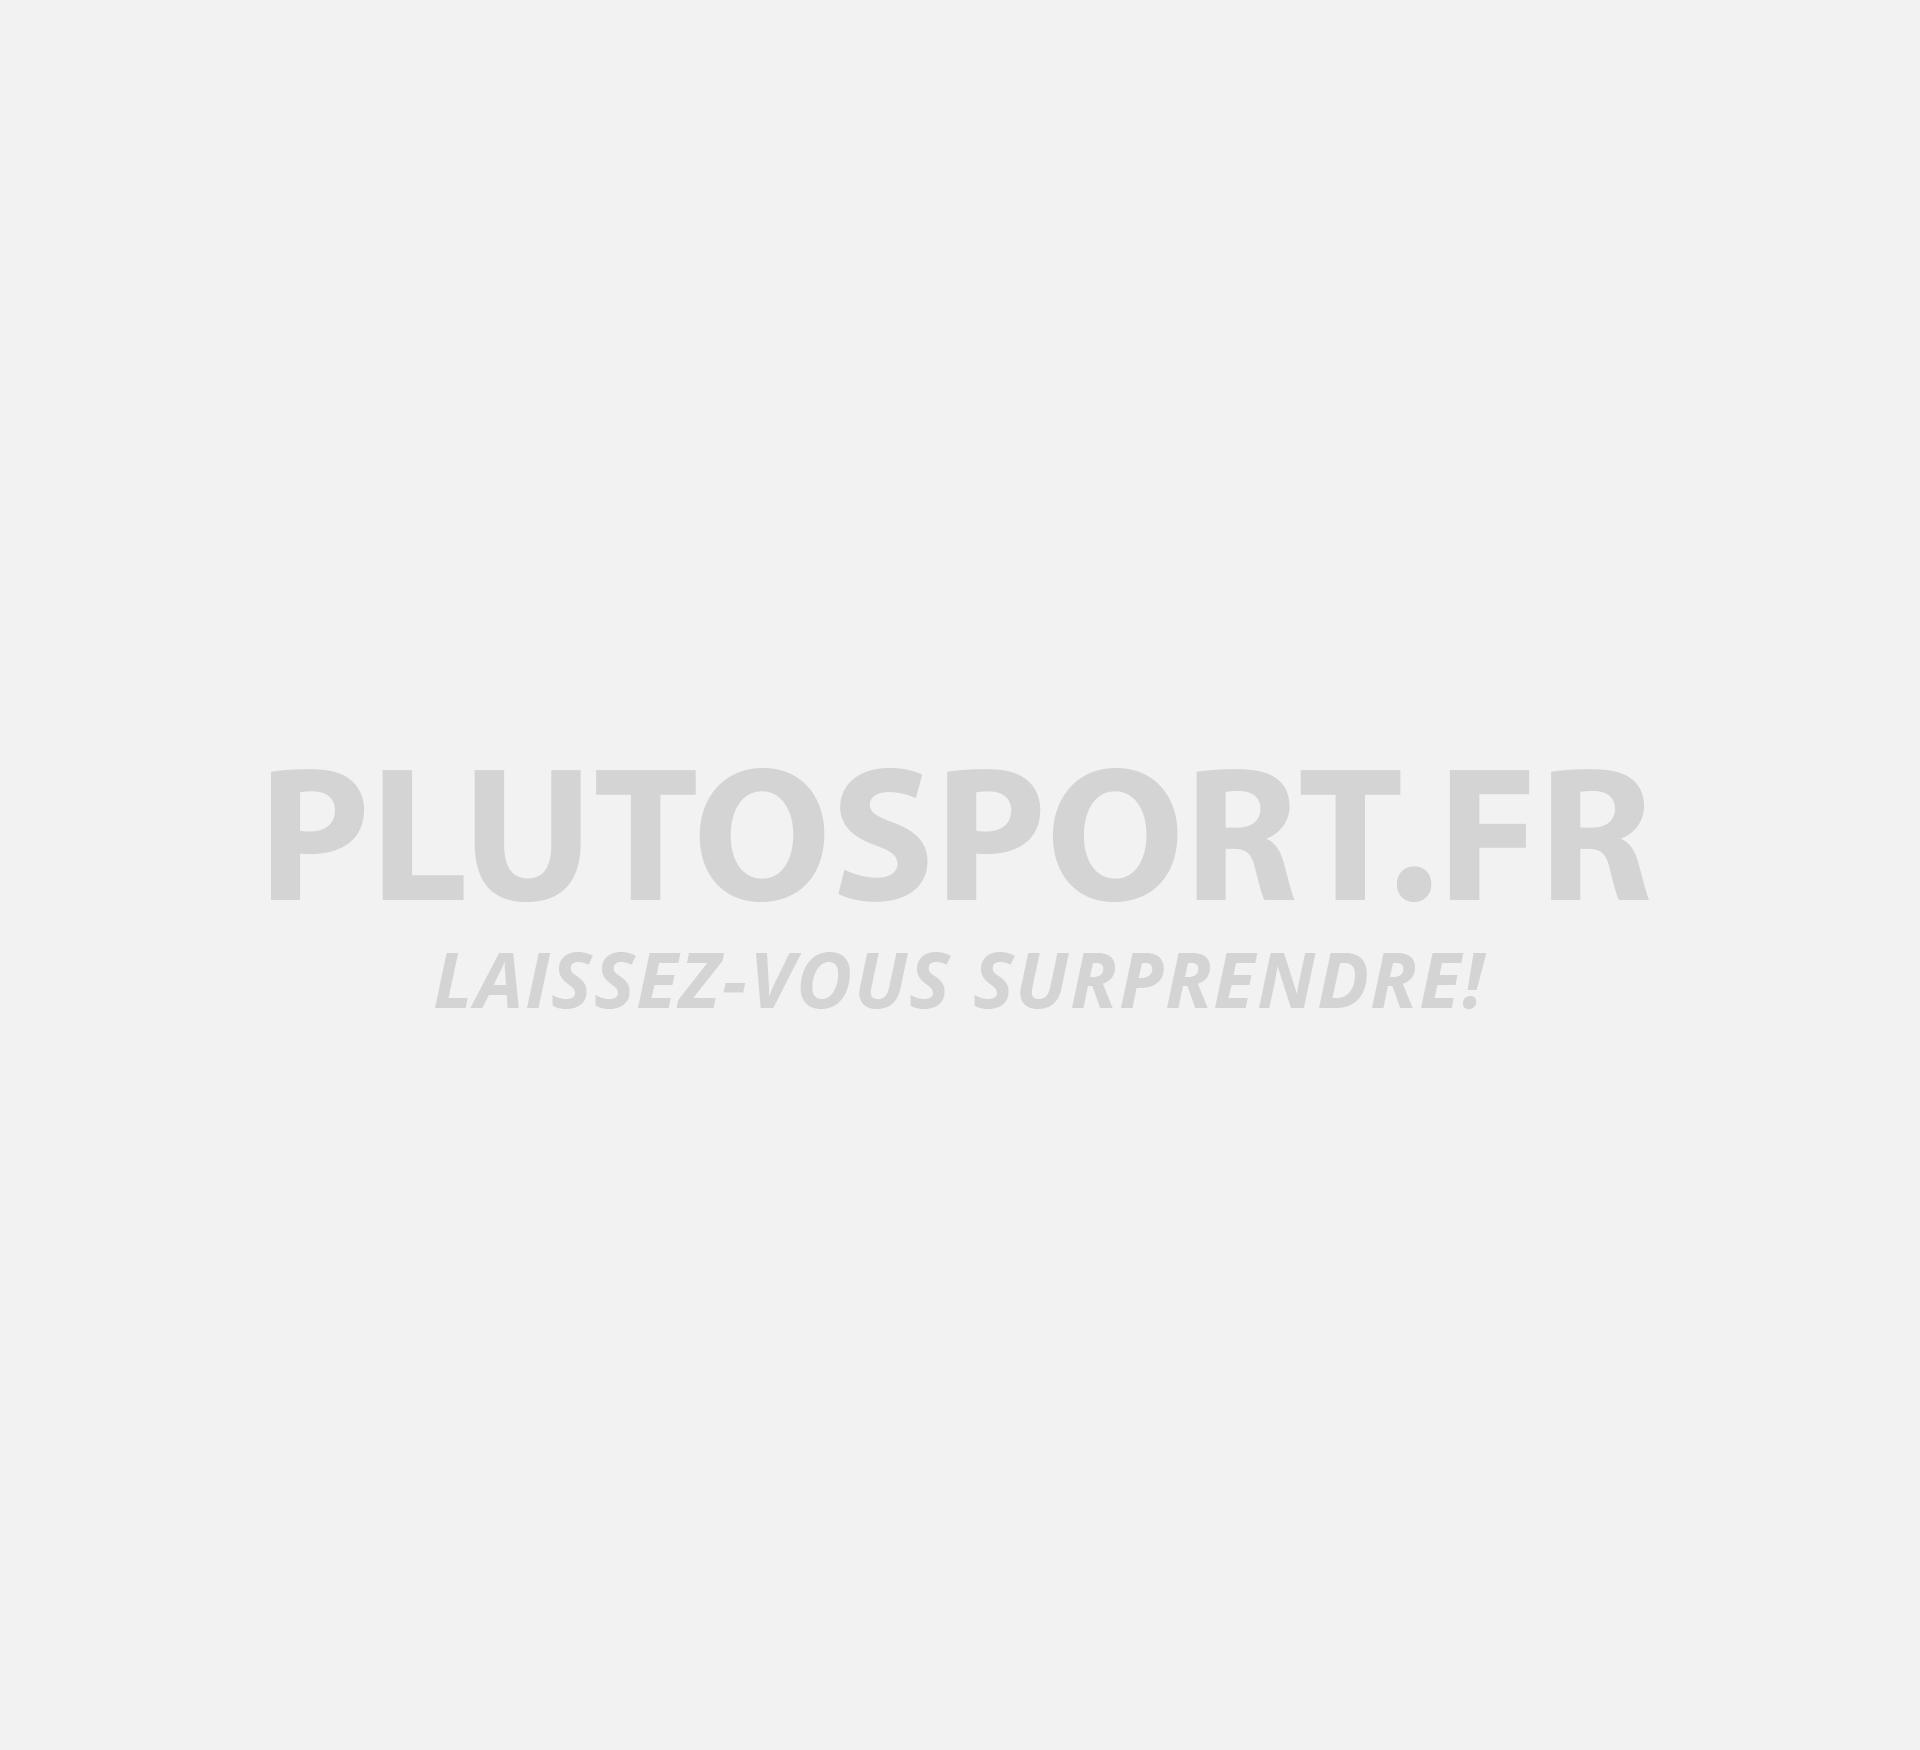 Chaussure de sport pour femmes Ugg Tye Stardust W